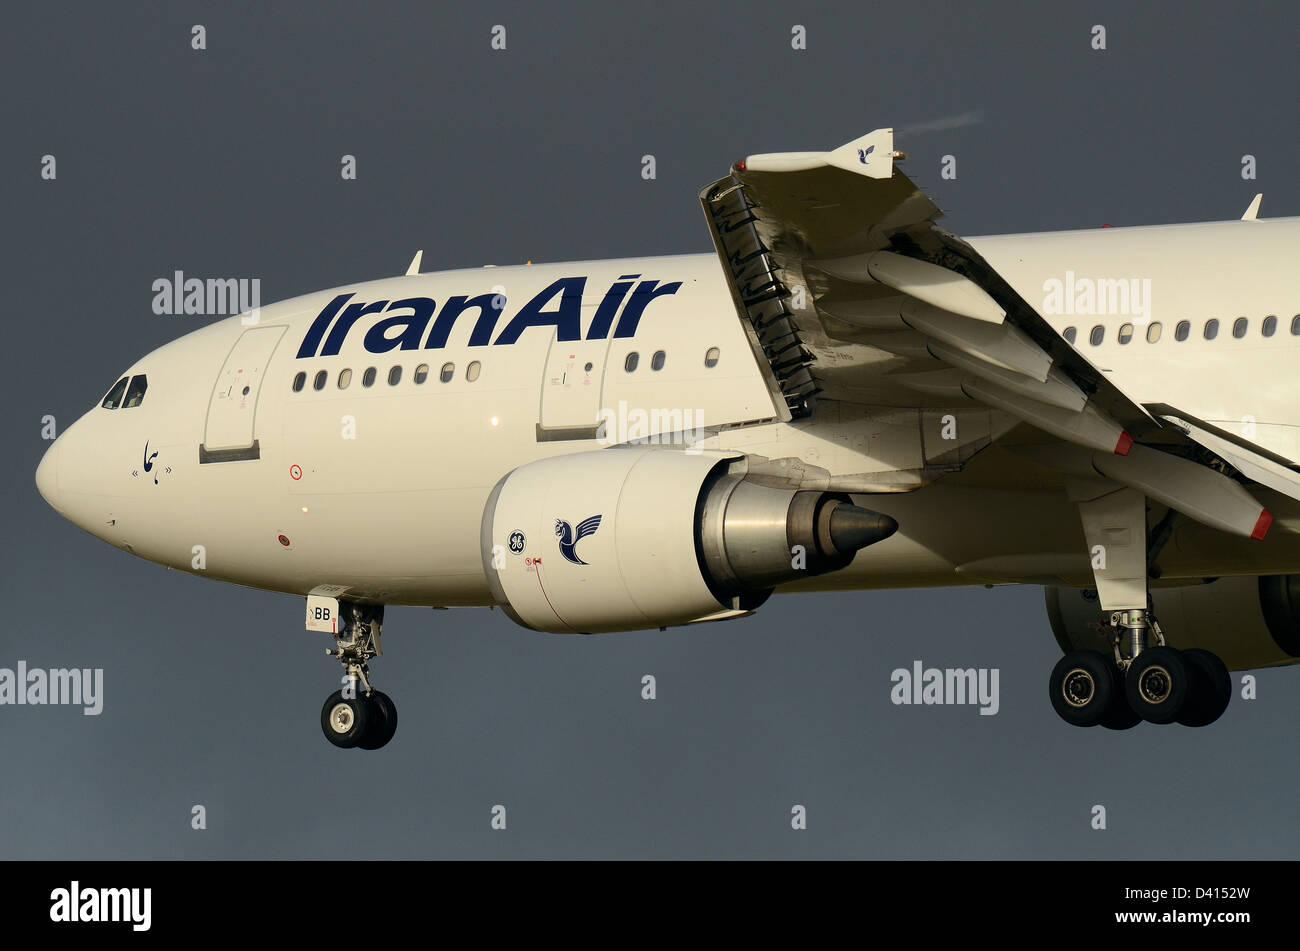 iran-air-airbus-a300-b4-605r-ep-ibb-coming-in-to-land-at-london-heathrow-D4152W.jpg